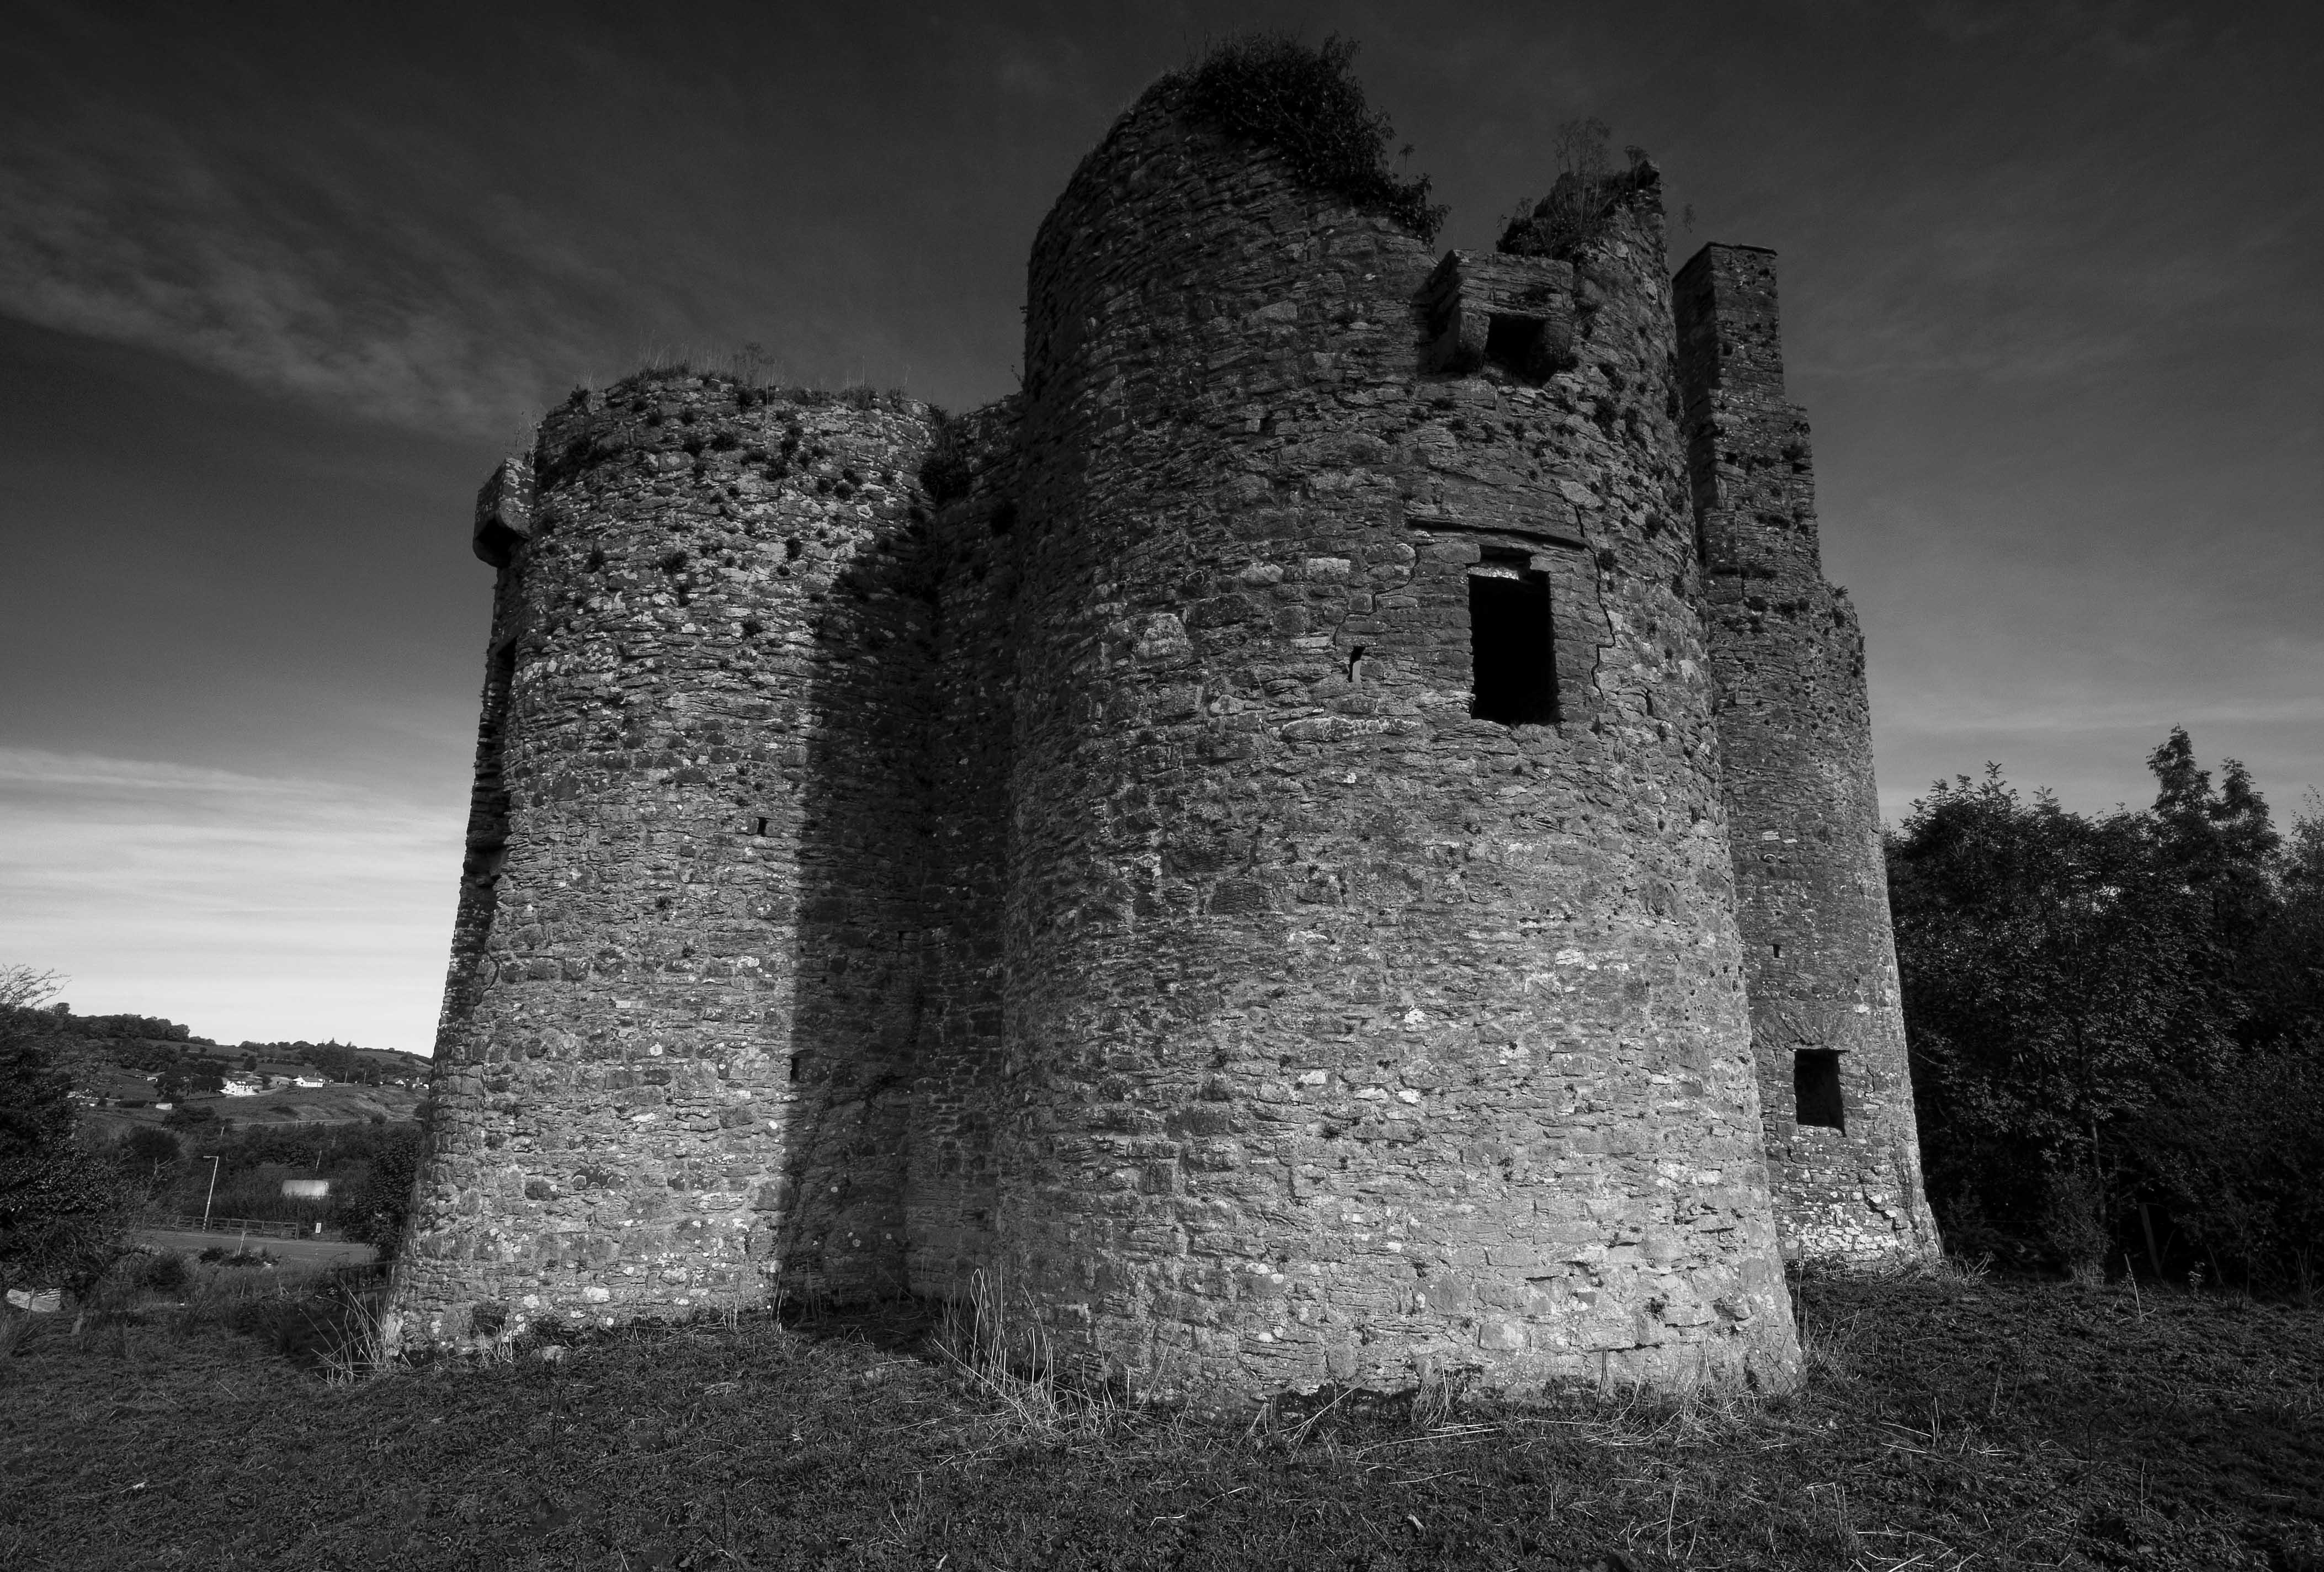 FileBallinafad Castle Co Sligo Irelandjpg Wikimedia